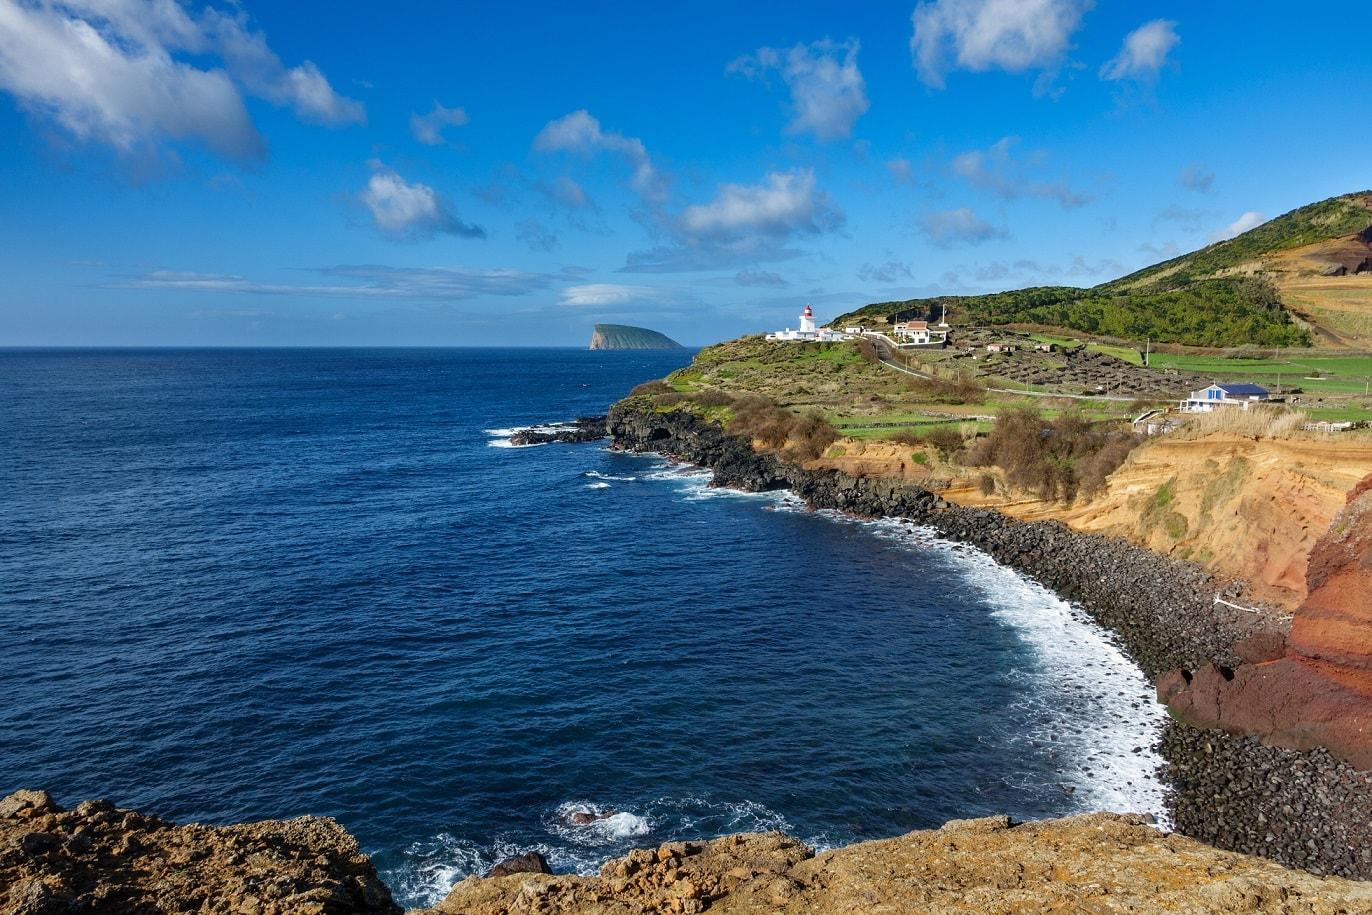 Passeio de Van na Ilha Terceira nos Açores